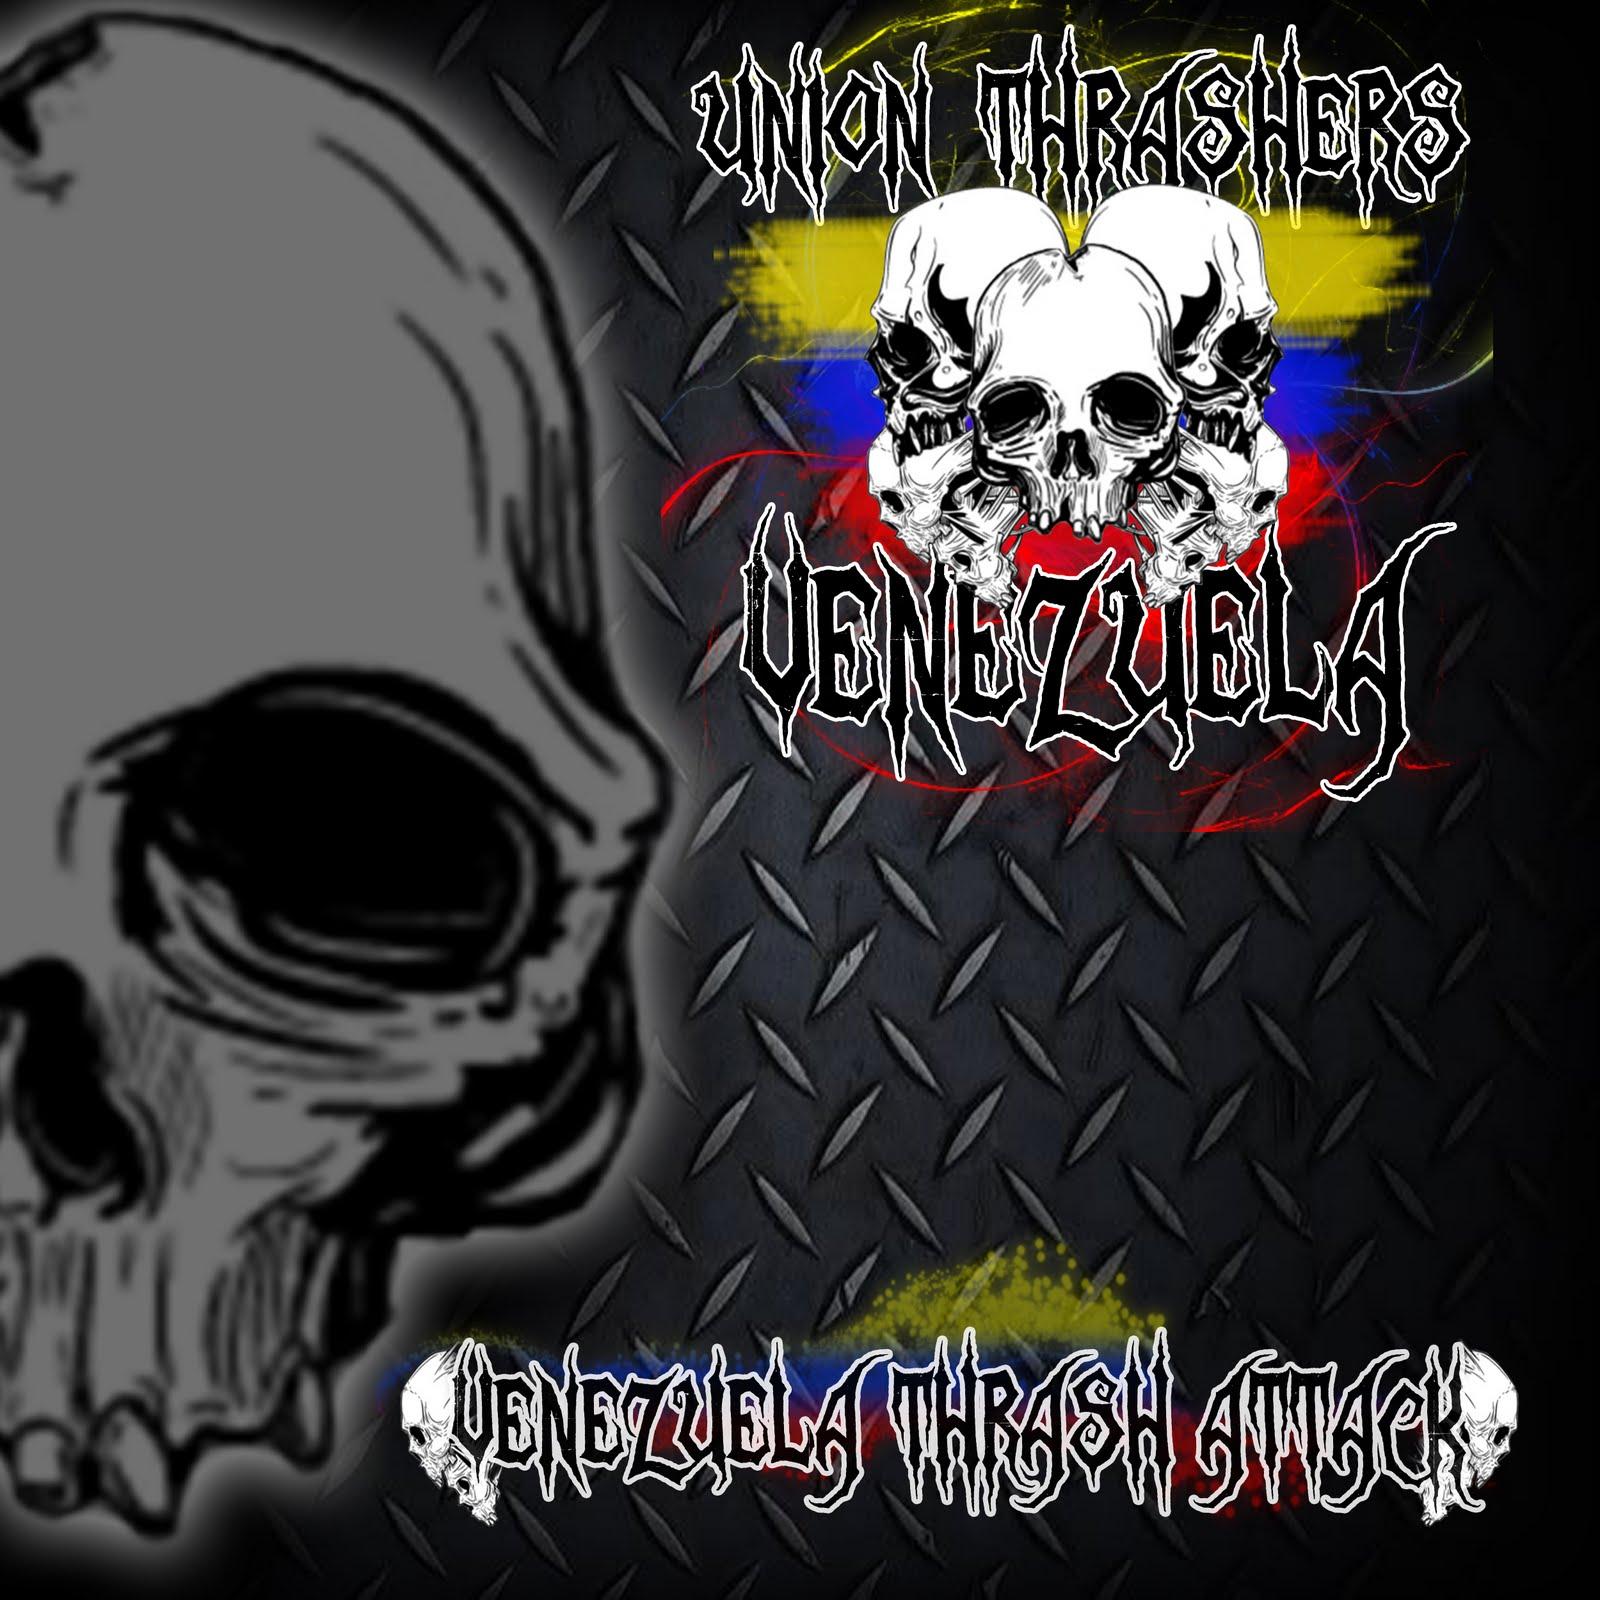 Venezuela Thrash Attack Vol 1 (Compilado 2010) CARATULA-COMPILADO-UTV